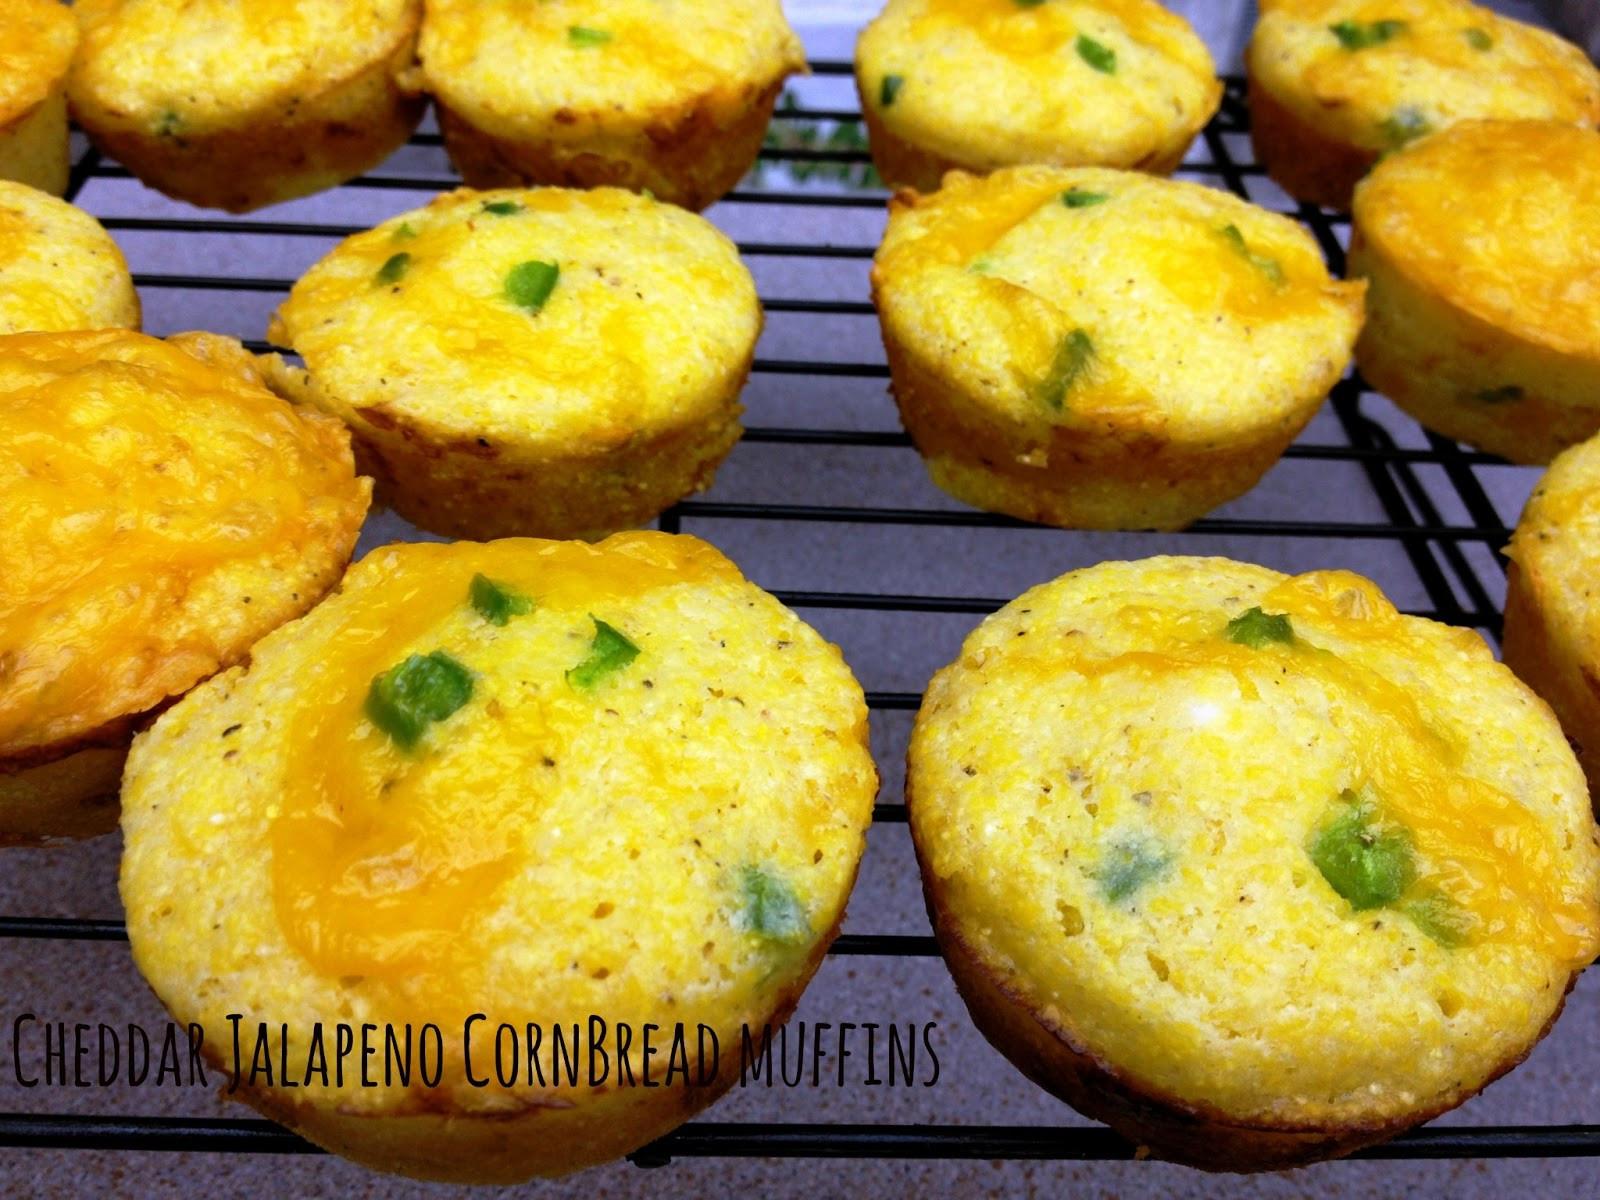 Jalapeno Cornbread Muffins  Cheddar Jalapeno Cornbread Muffins Cooking Quidnunc